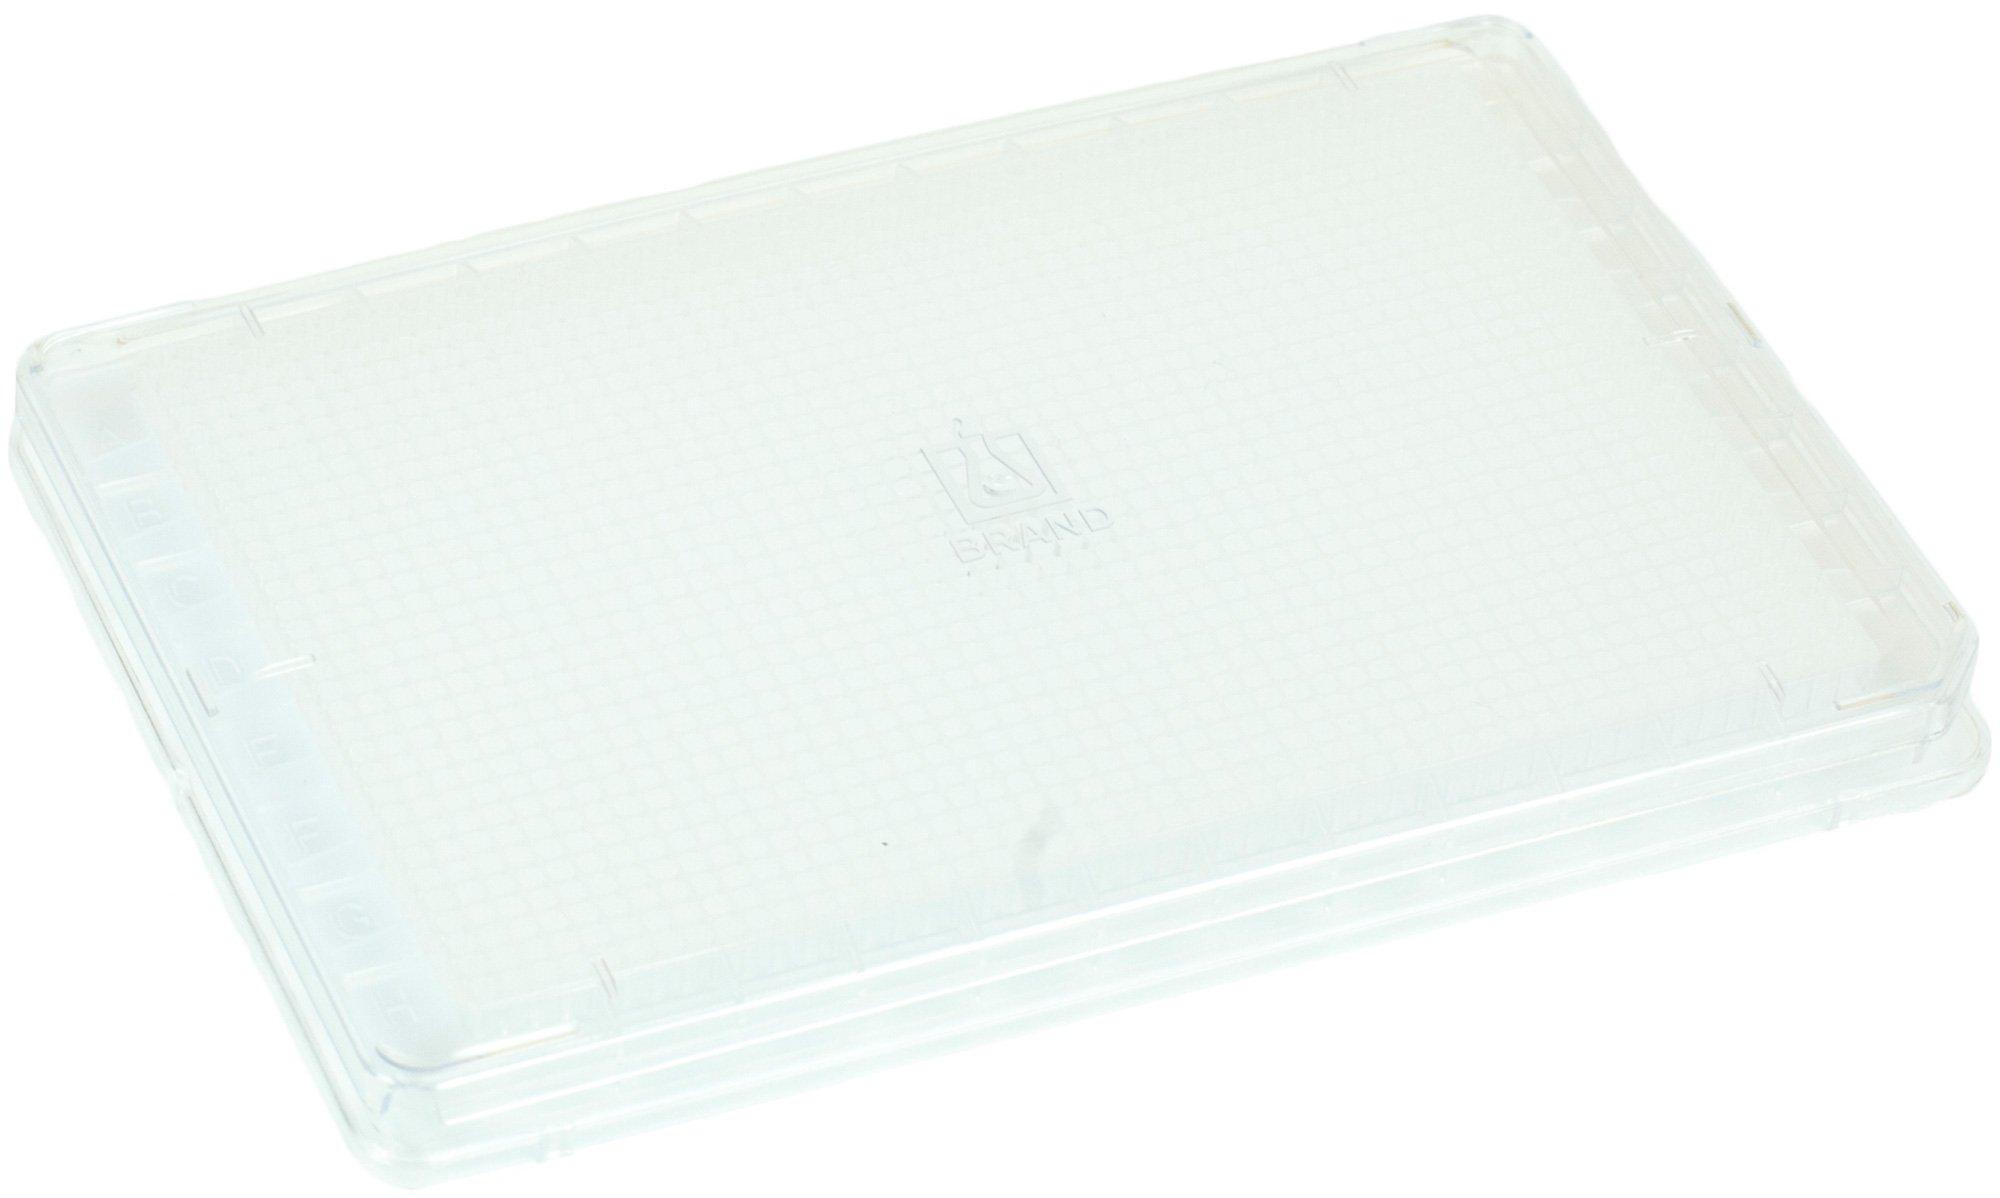 BRANDplates cellGrade Treated Sterile Surface 1536-Well Plate - Transparent, F-Bottom